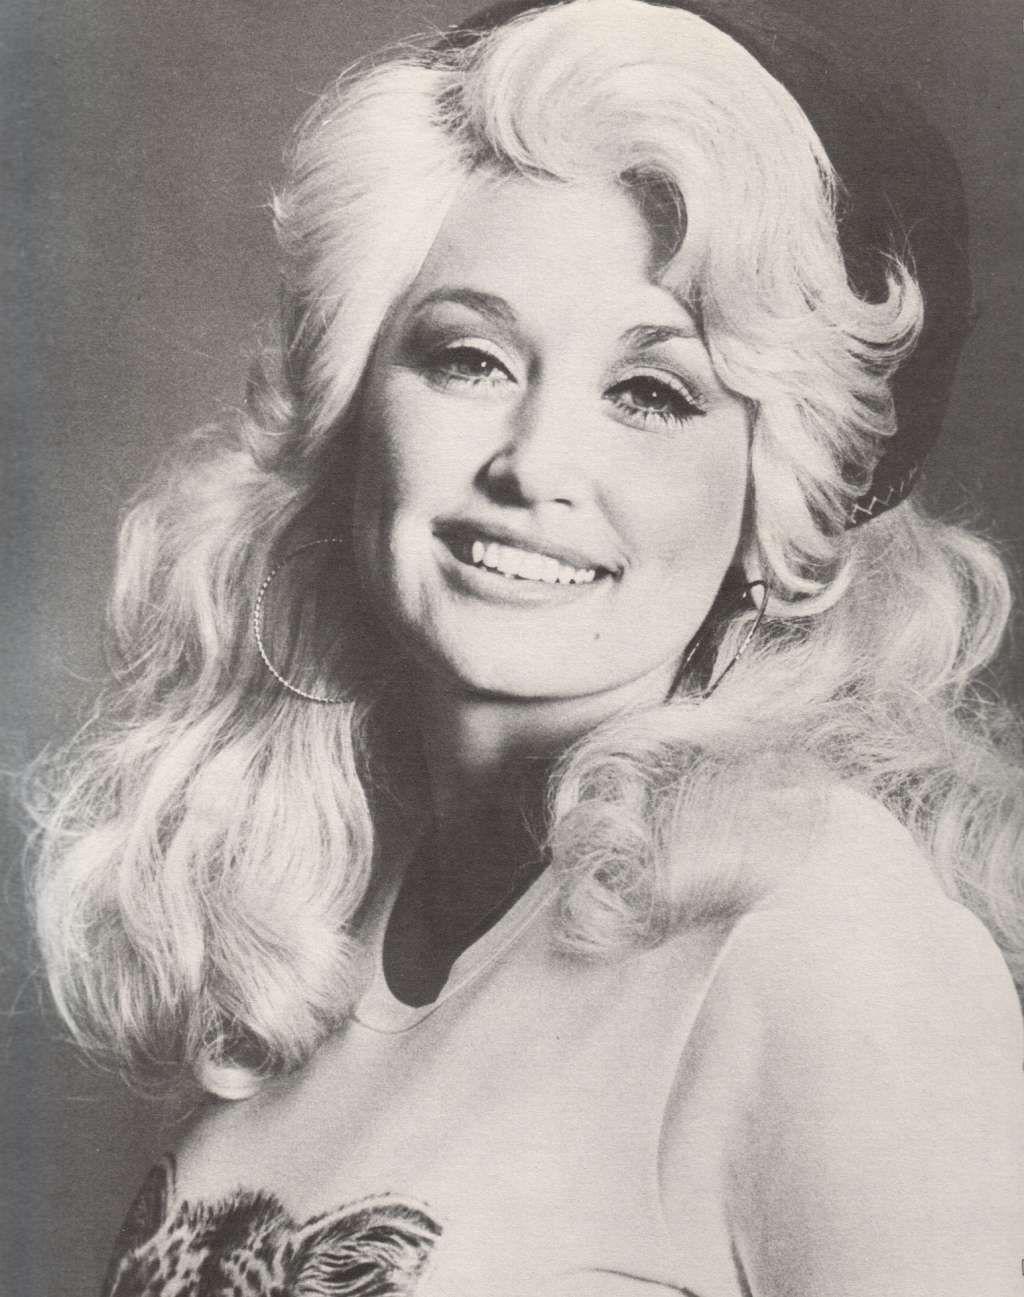 Young Dolly Parton in Tank Top | Dolly parton pictures, Dolly parton ...